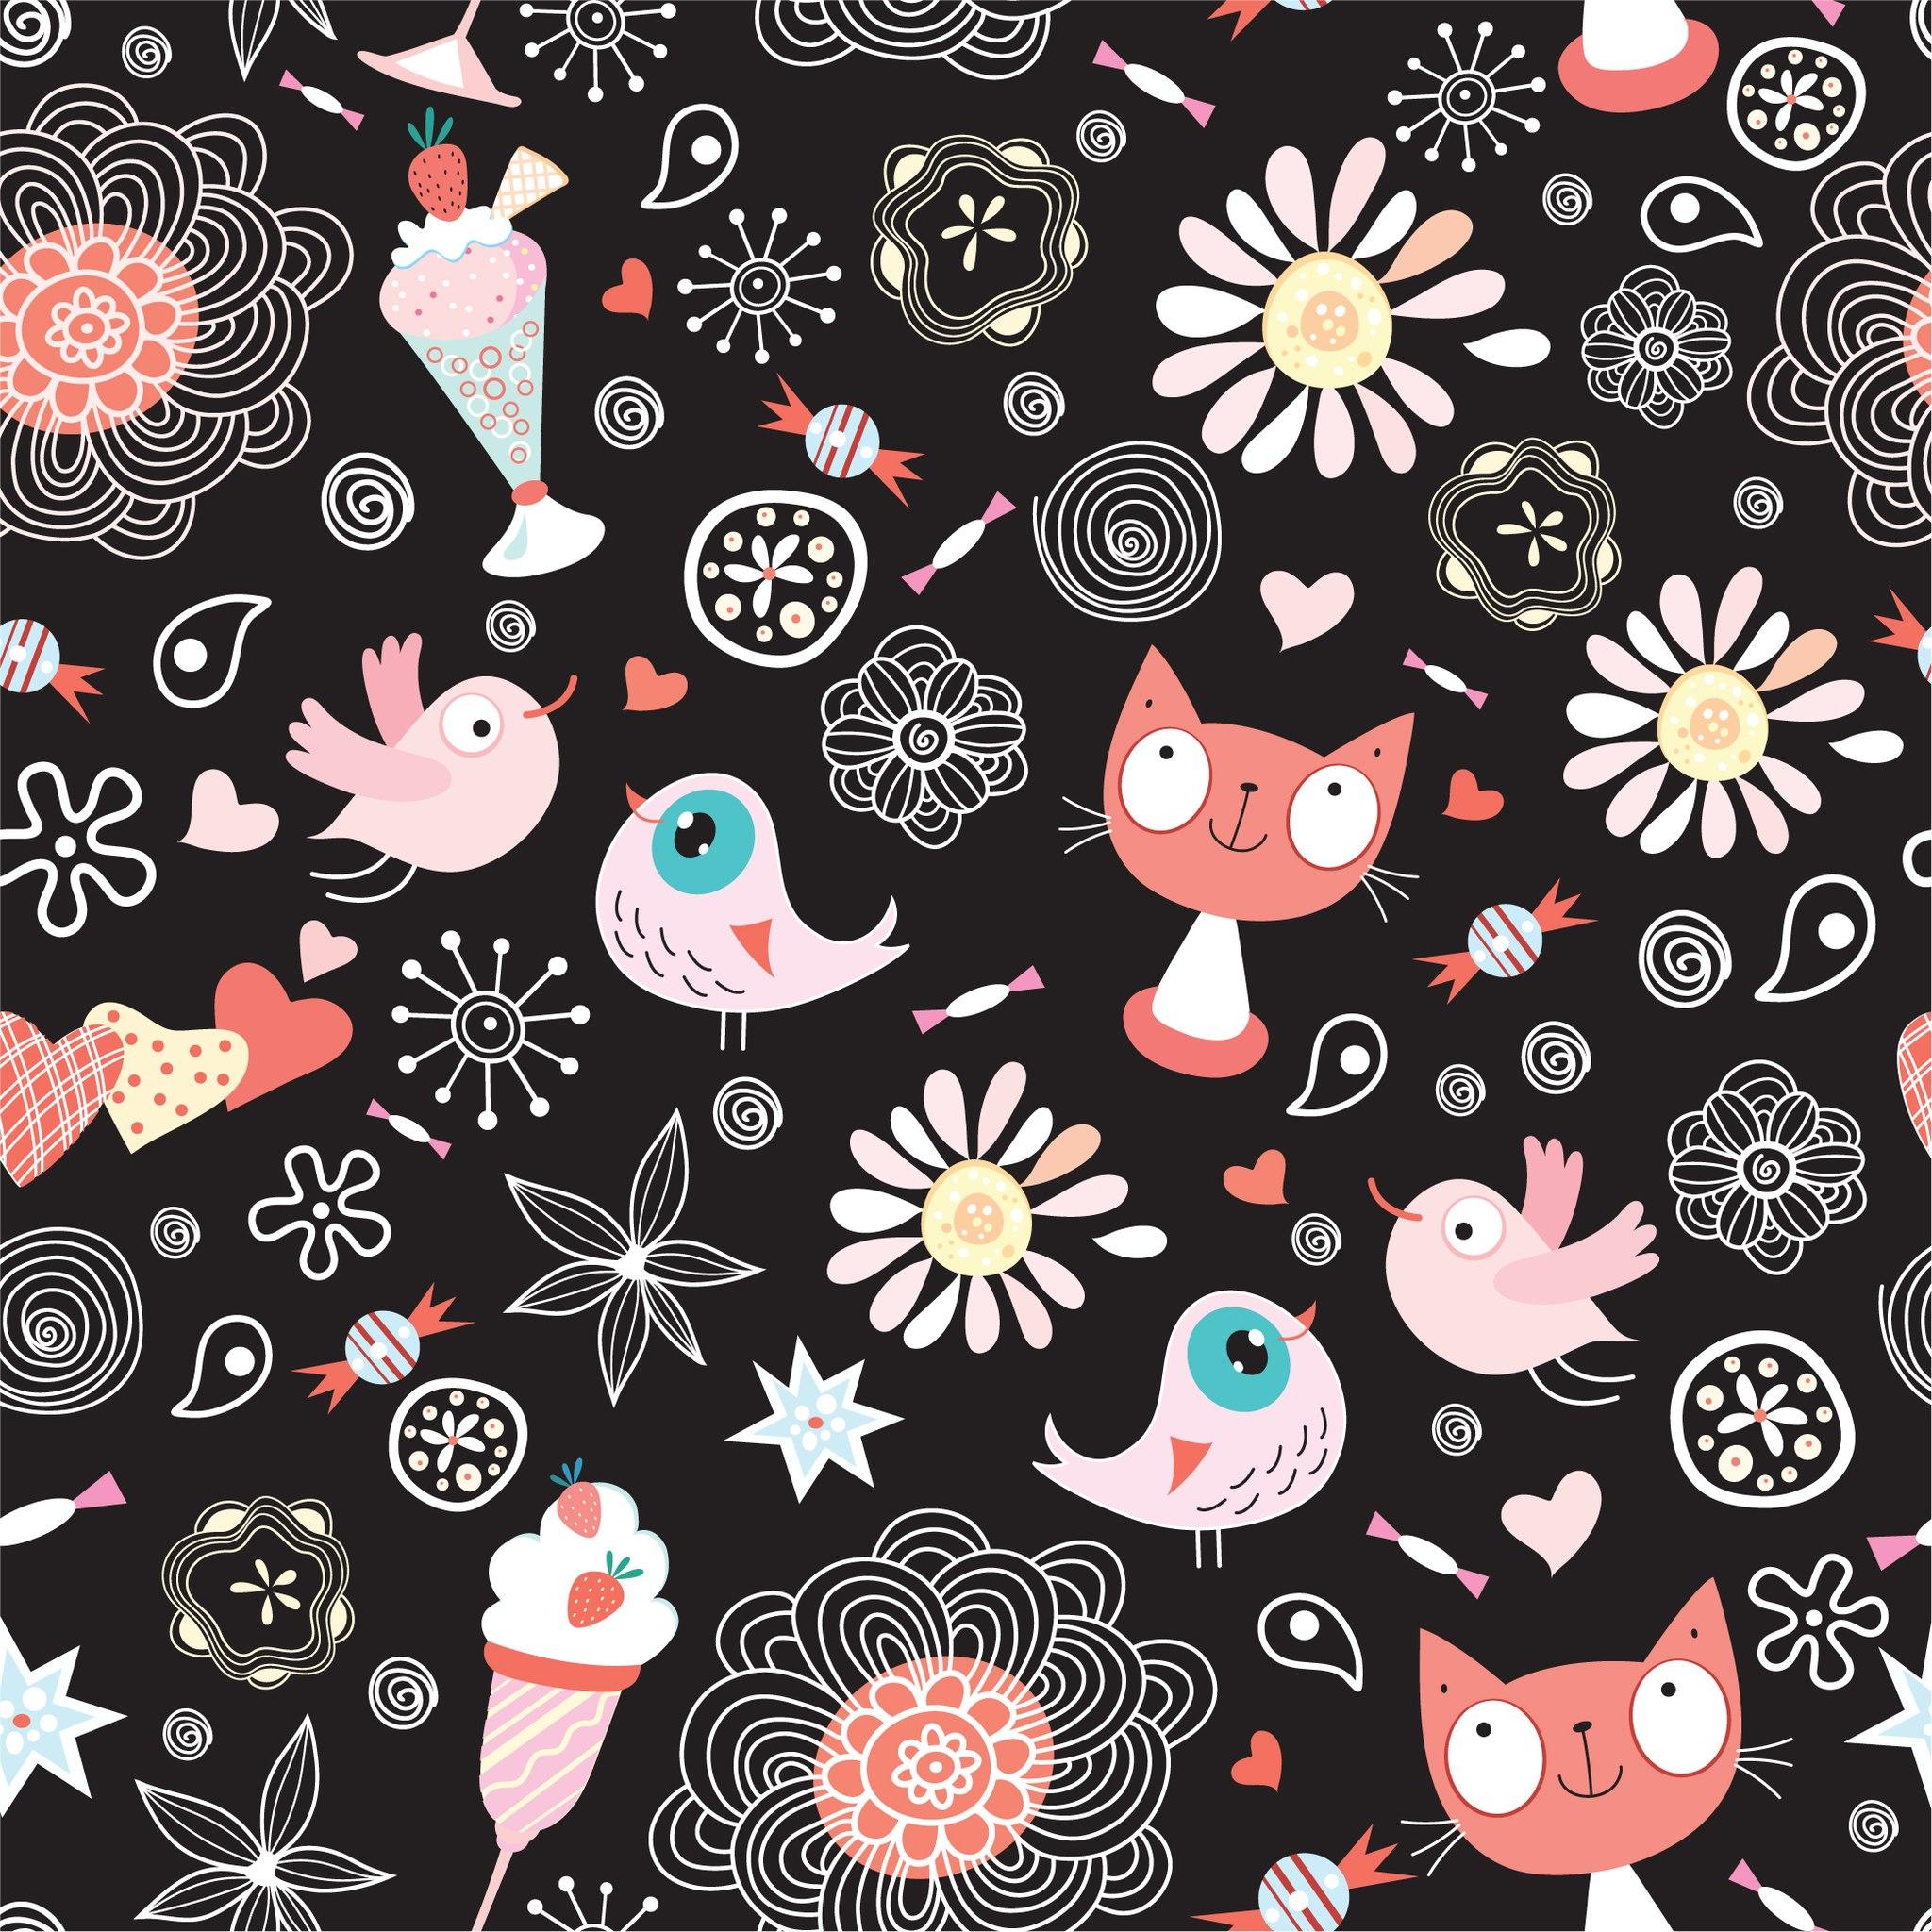 tumblr cute backgrounds - HD2048×2048